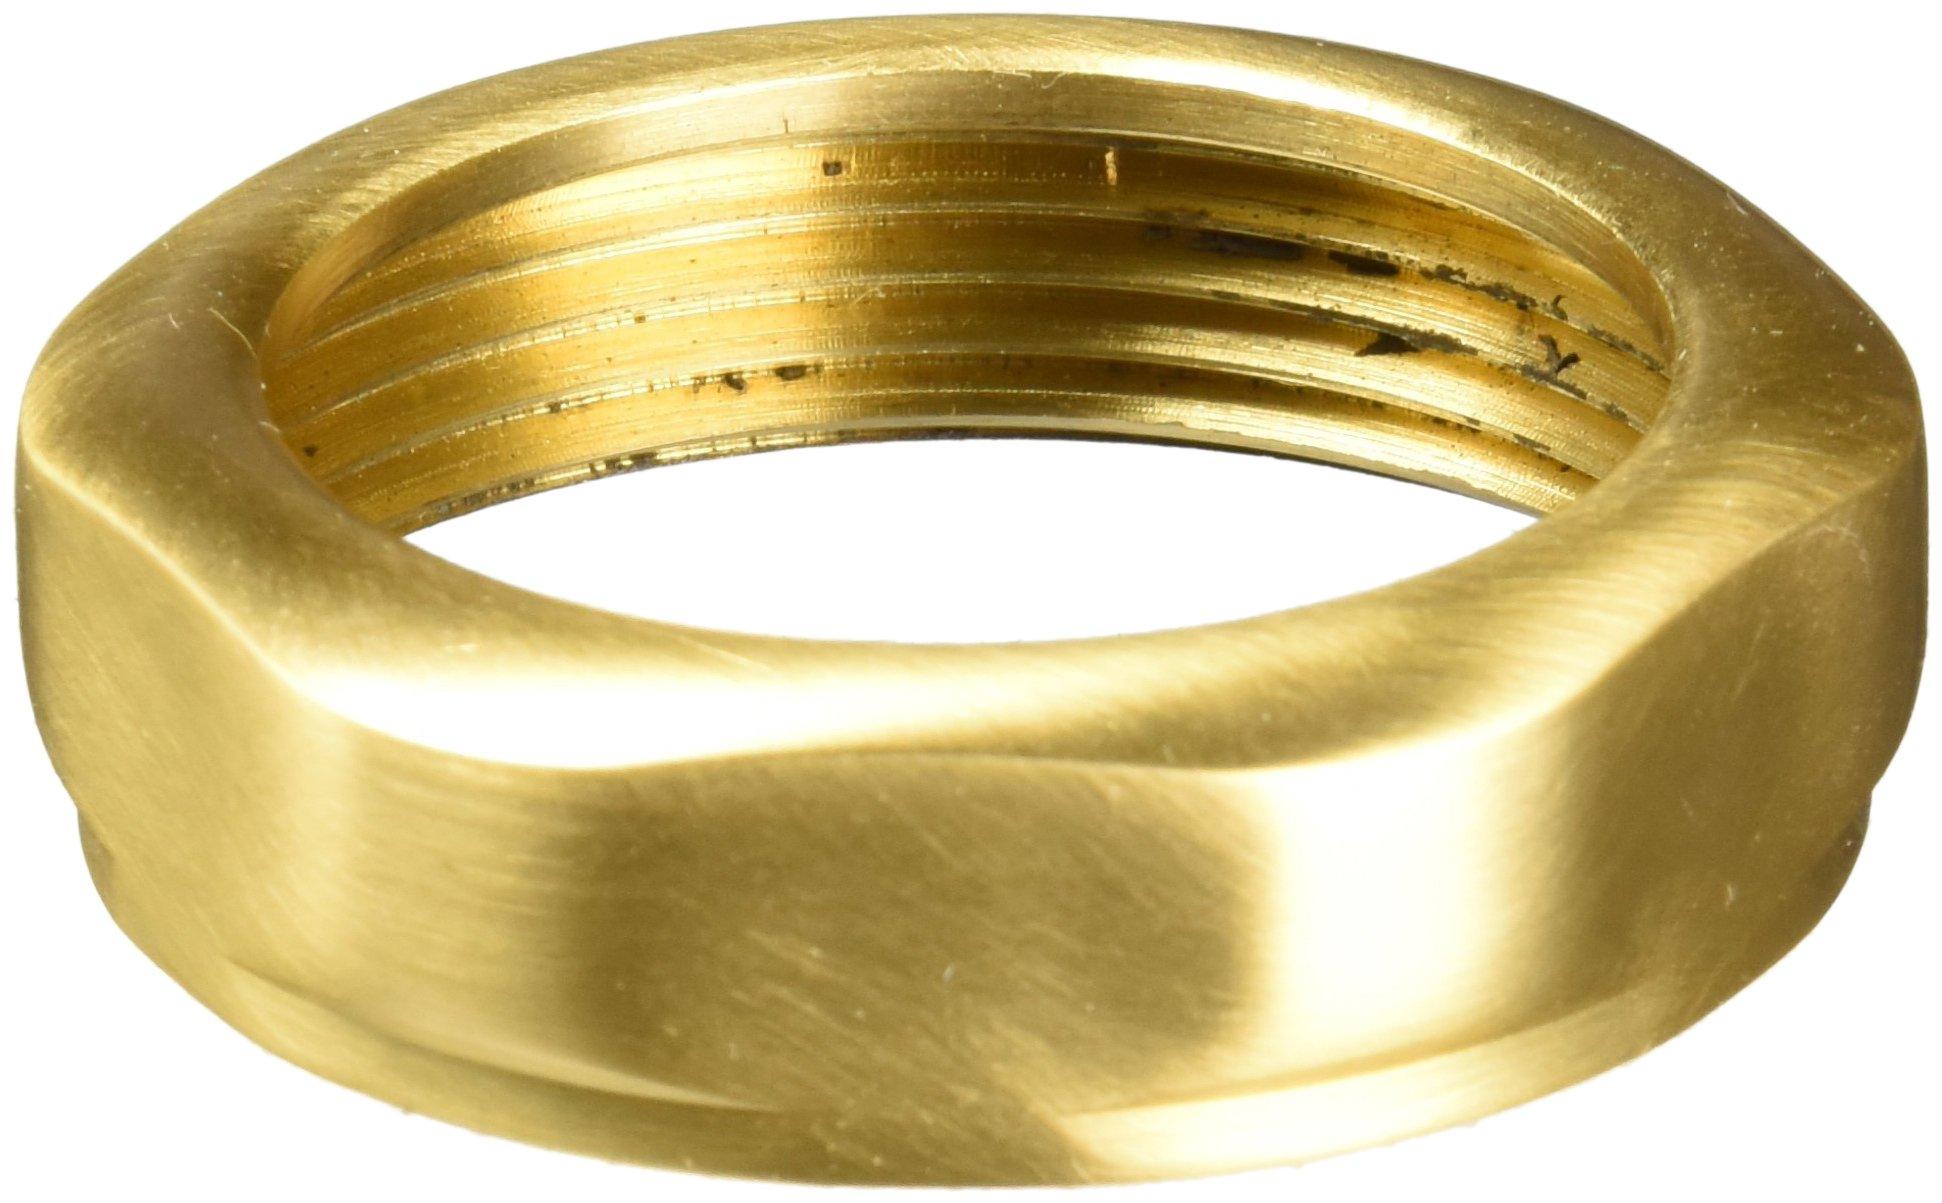 Jaclo 757-SB Solid Brass Slip Nut, 1-1/2'', Satin Brass by Jaclo